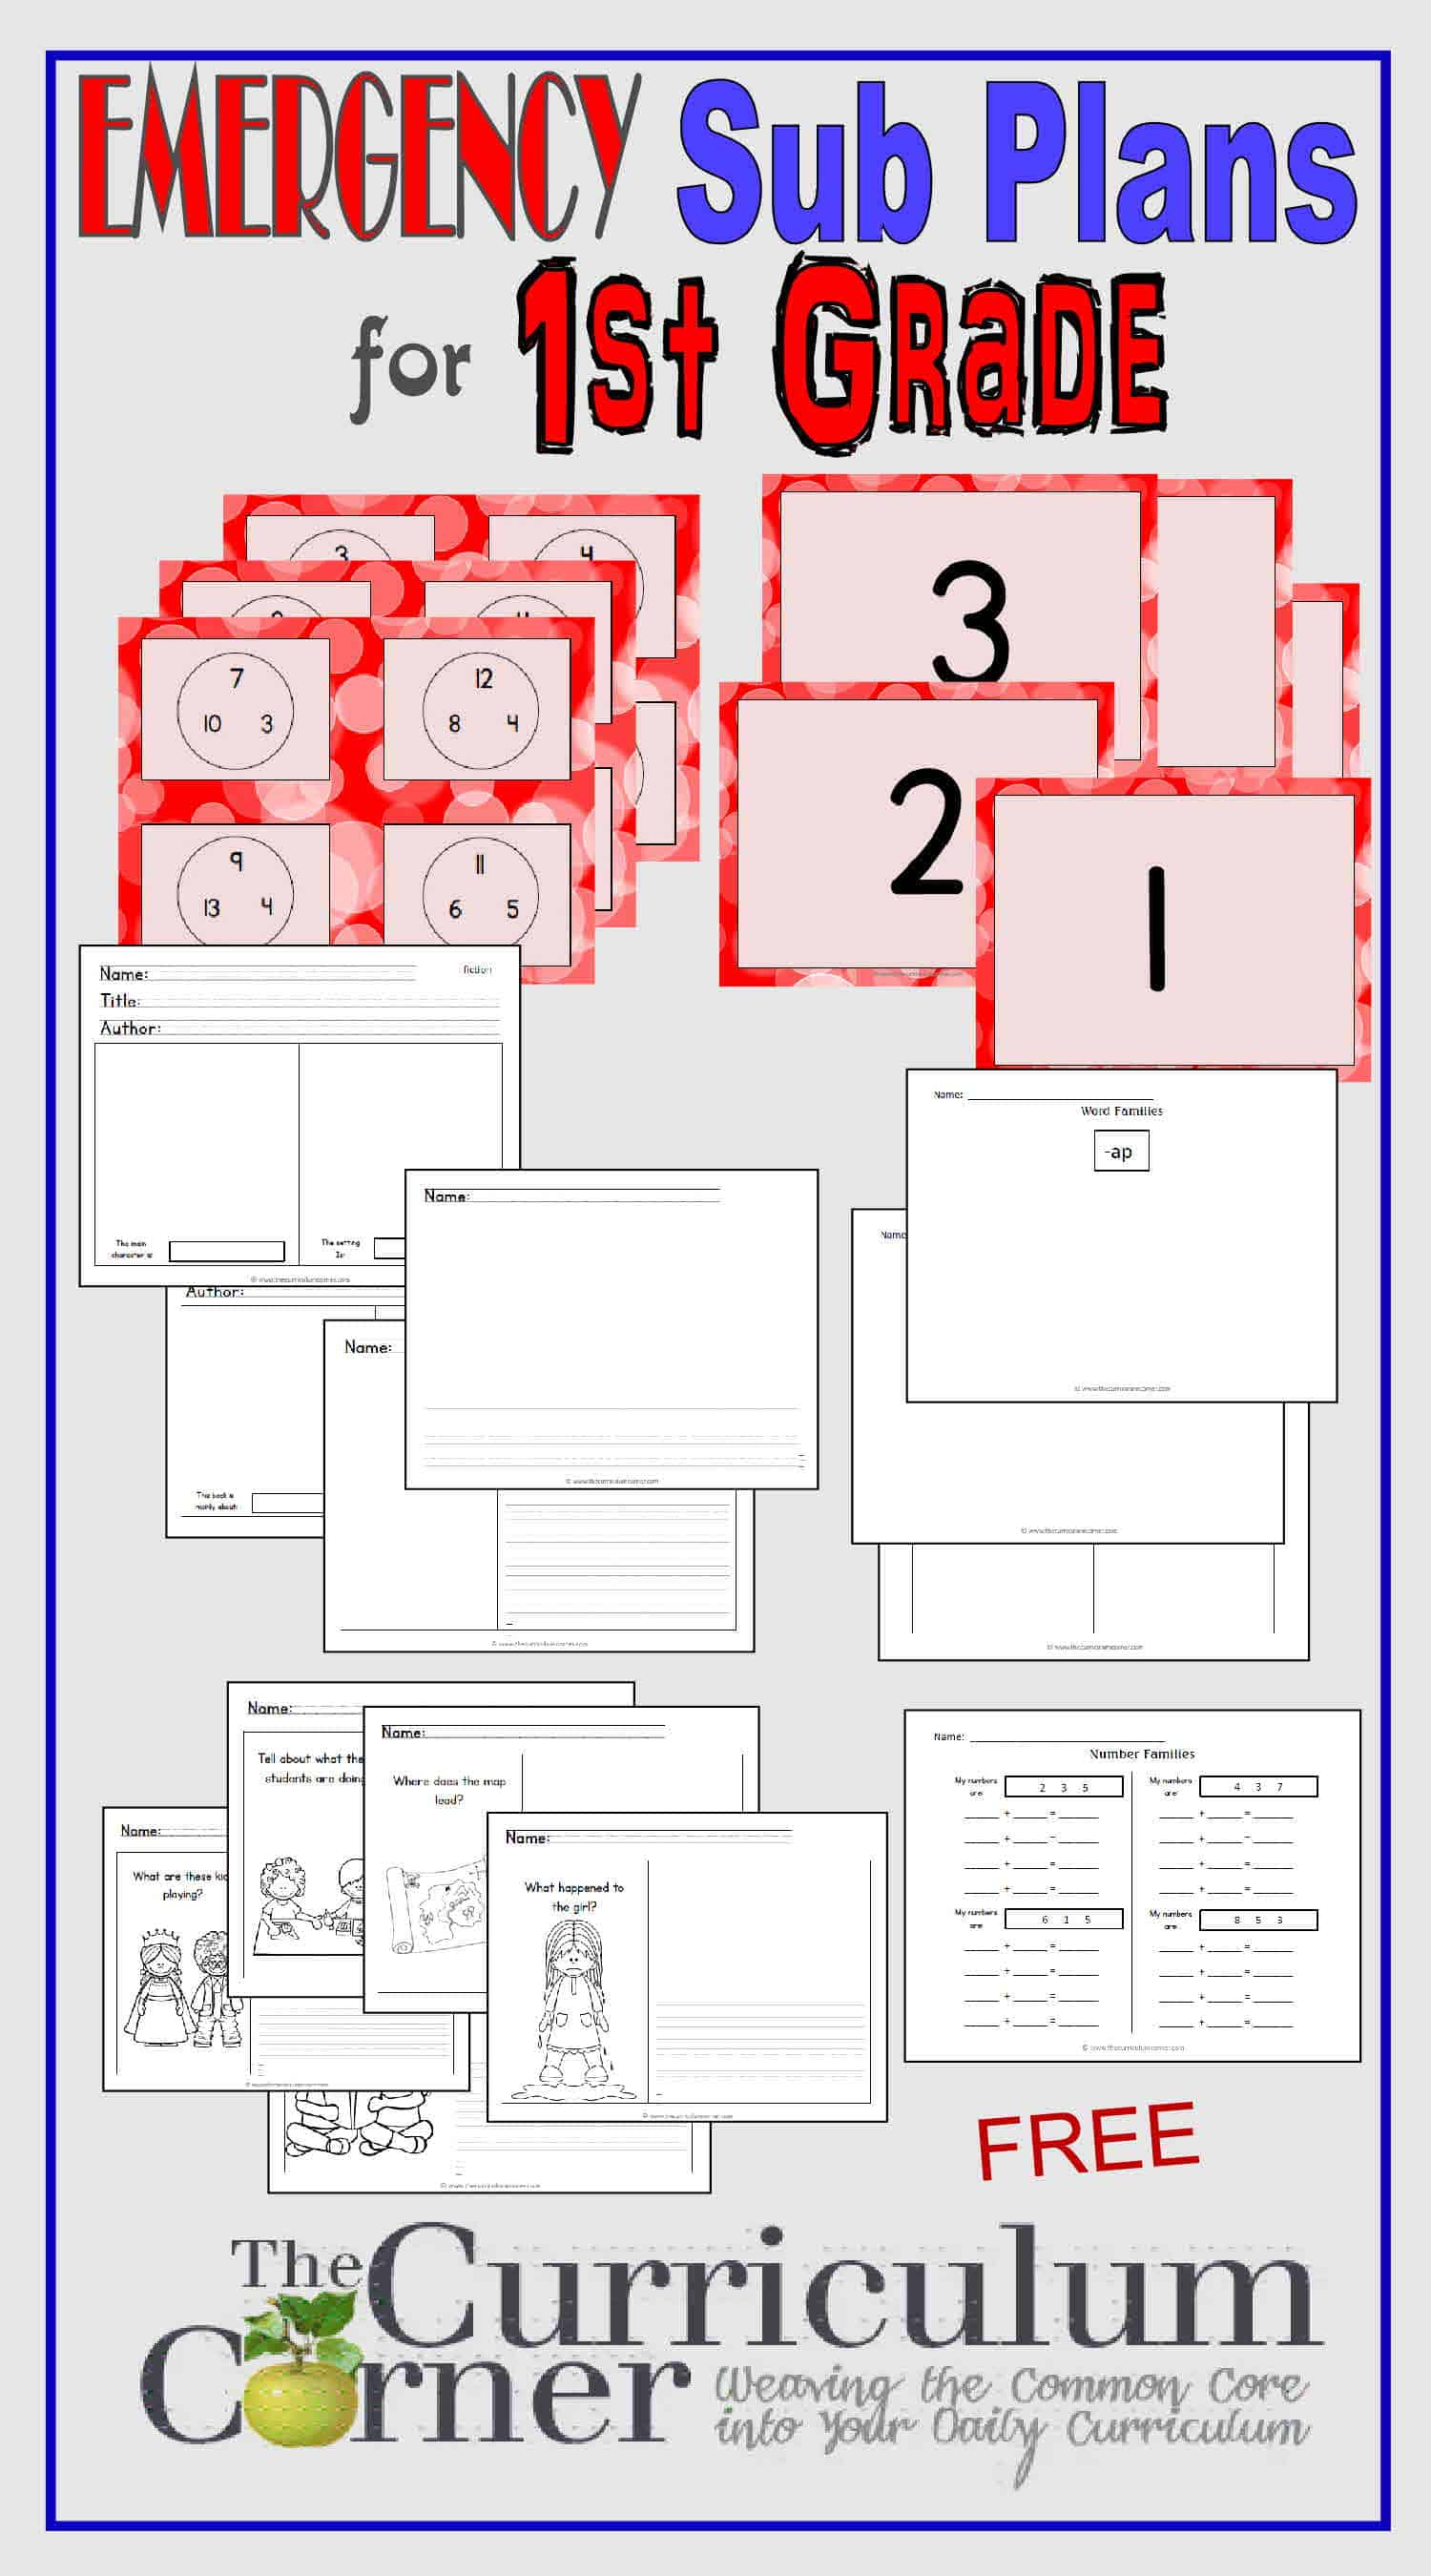 1st Grade Emergency Sub Plans - The Curriculum Corner 123